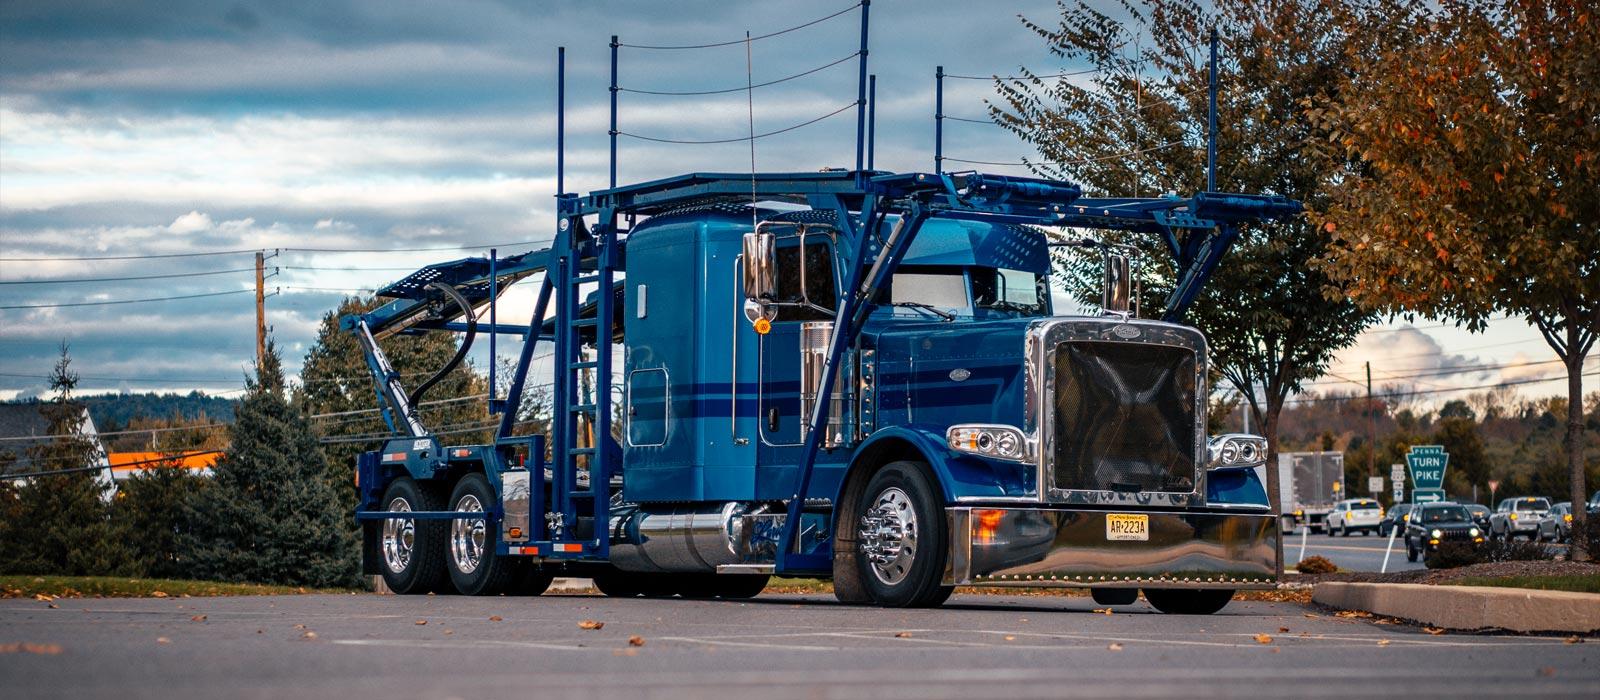 Horst Signs in PA Truck Lettering for Larick Transport Peterbilt Truck Graphics Rockaway NJ